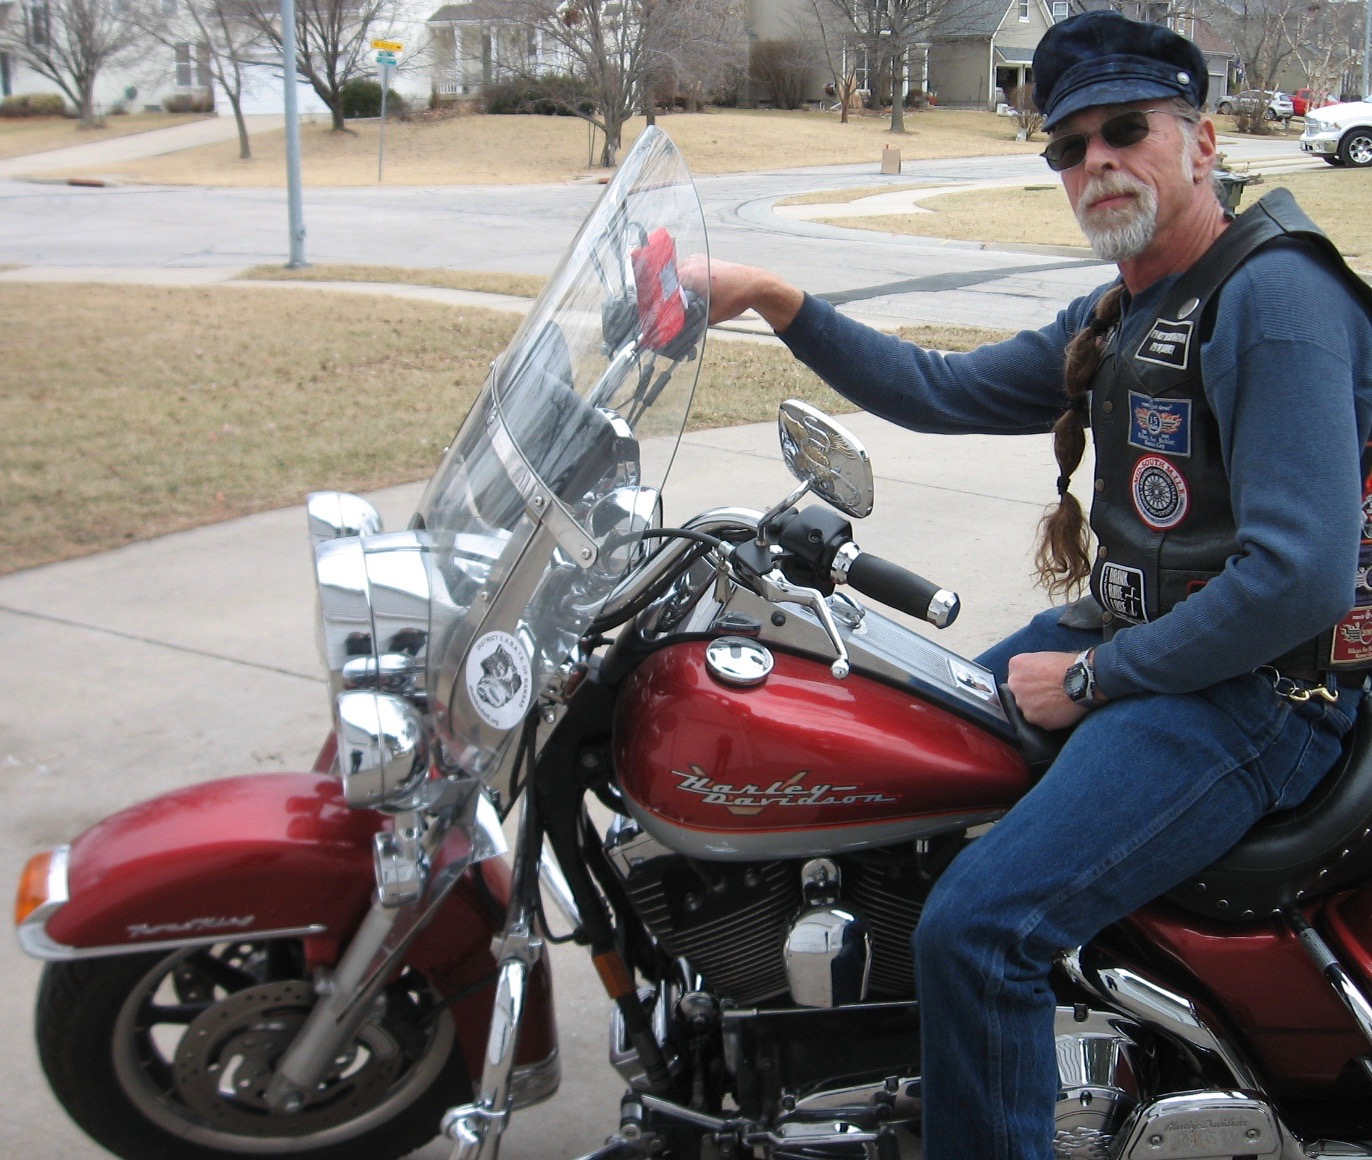 Tony with Fisherman Fiddler Biker Cap on Motorcycle